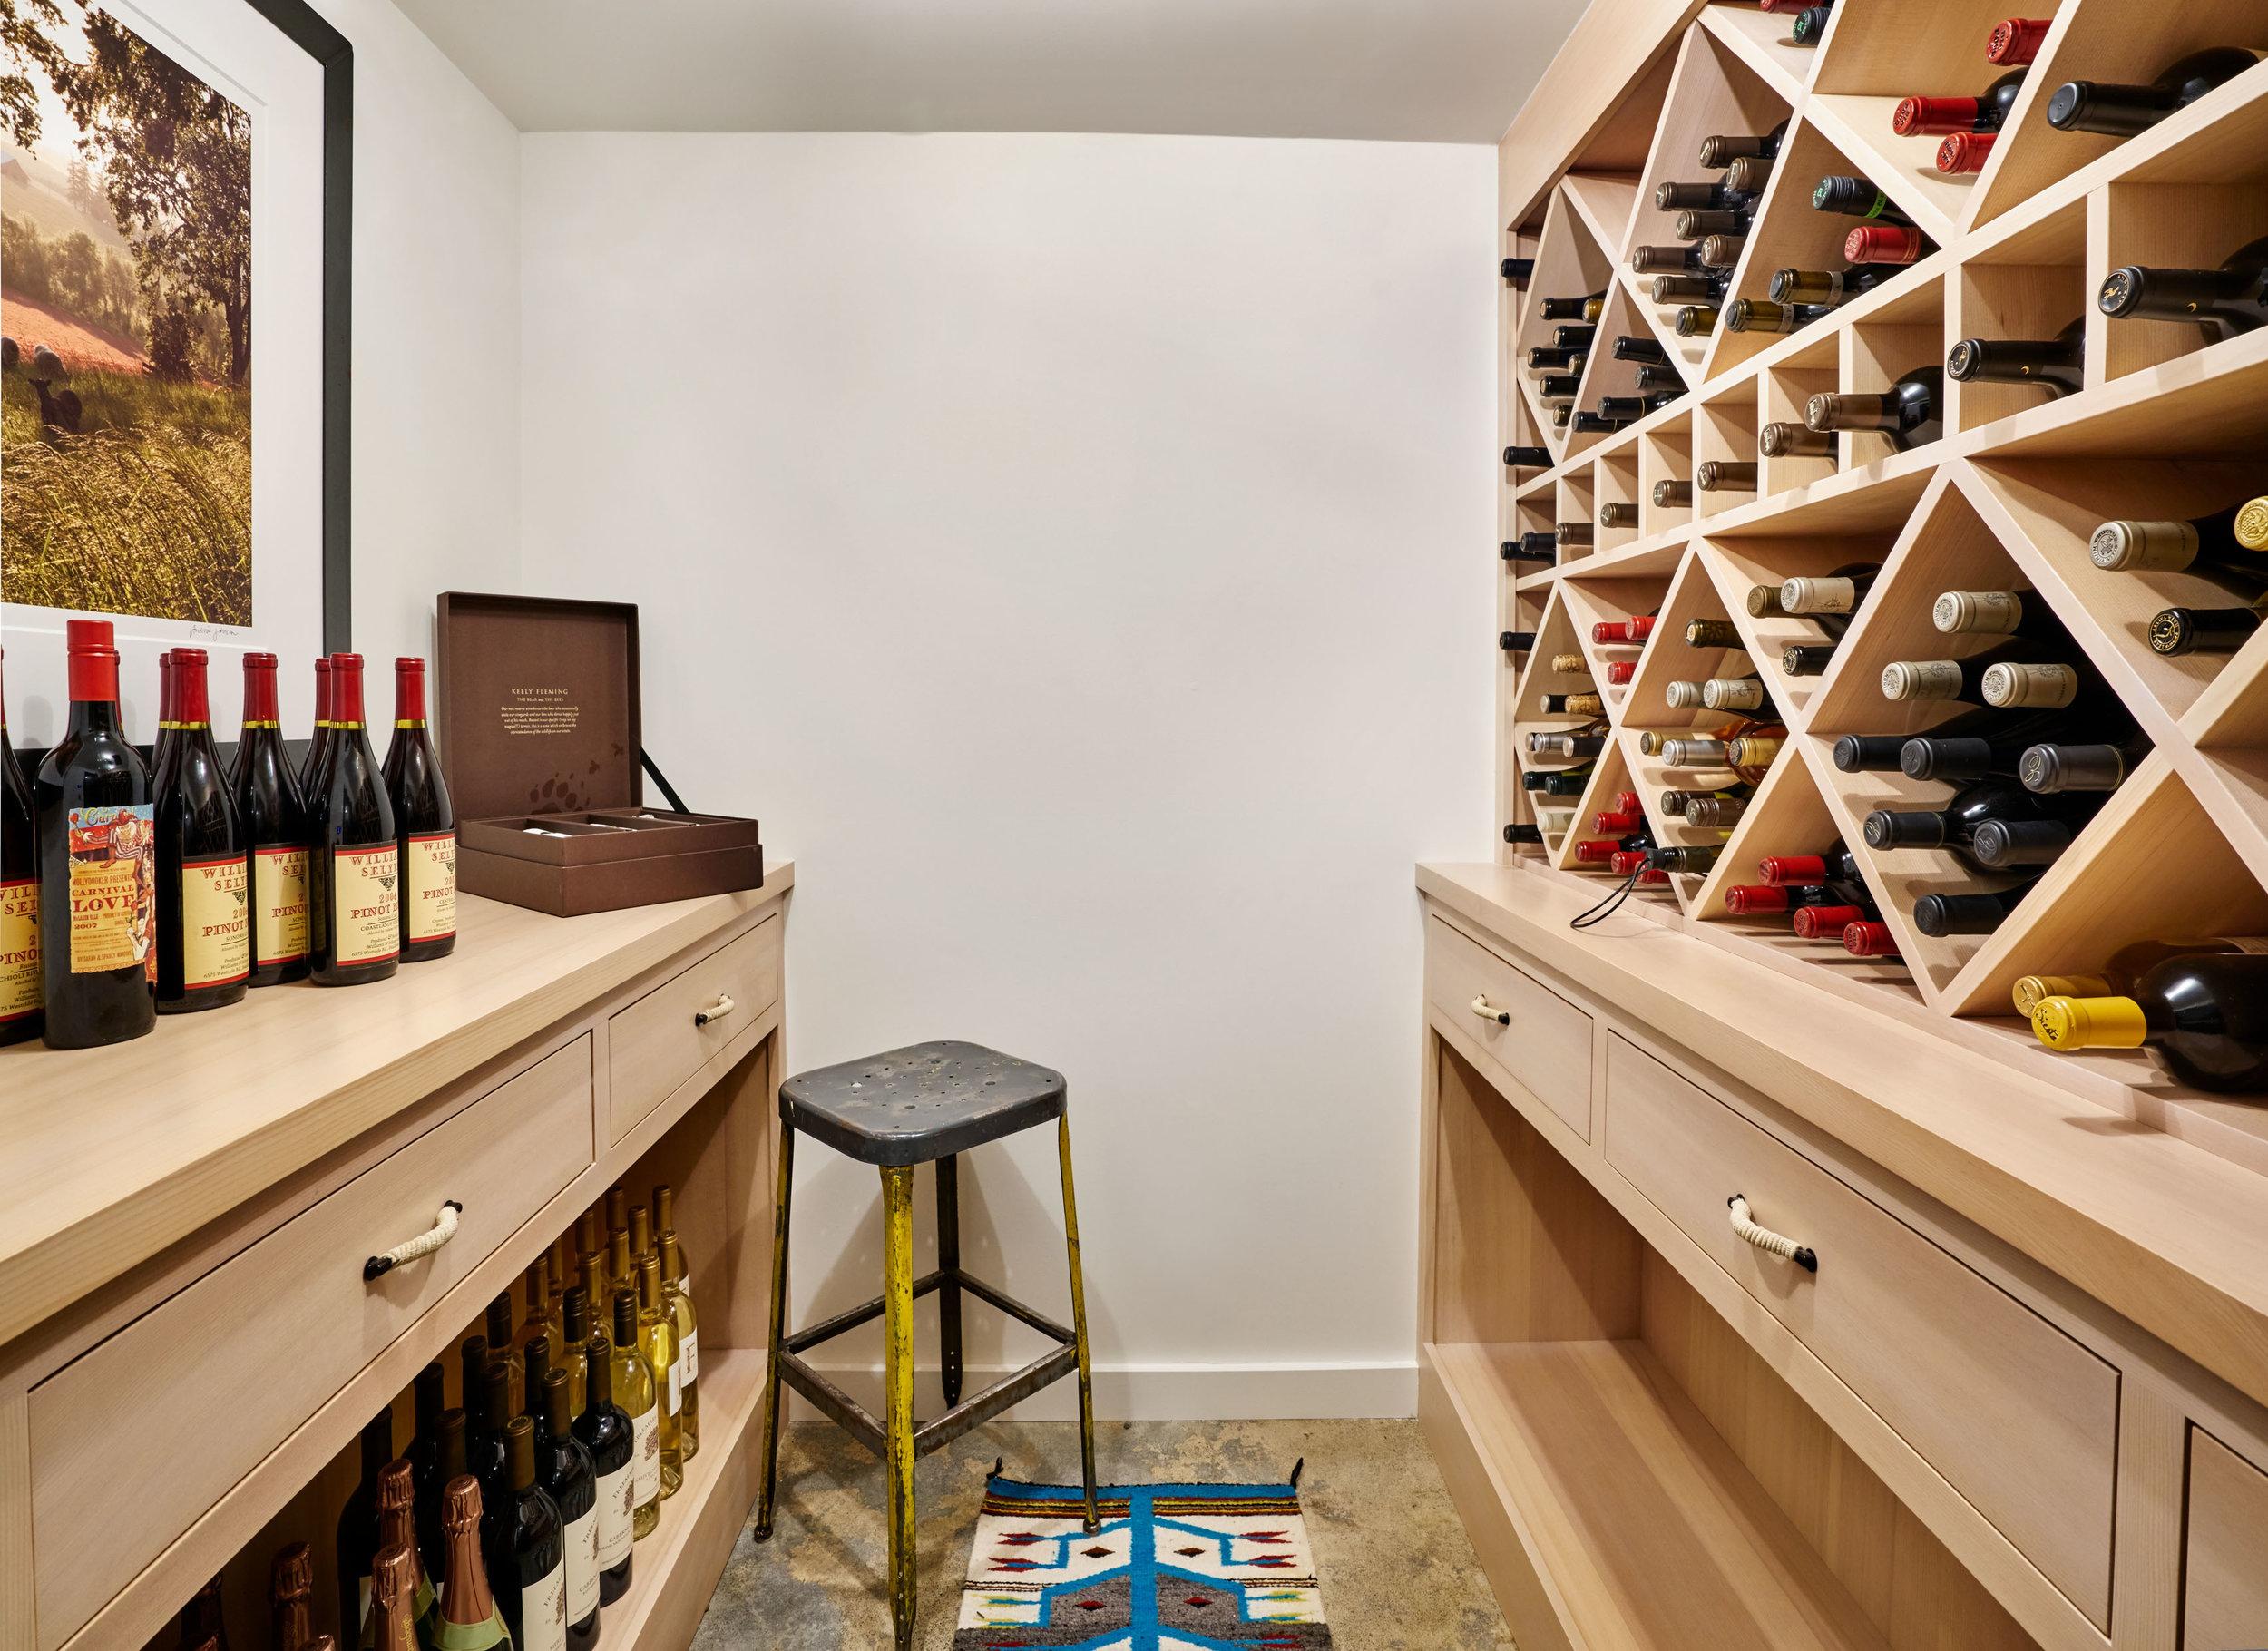 Wine cellar custom spruce built-ins.